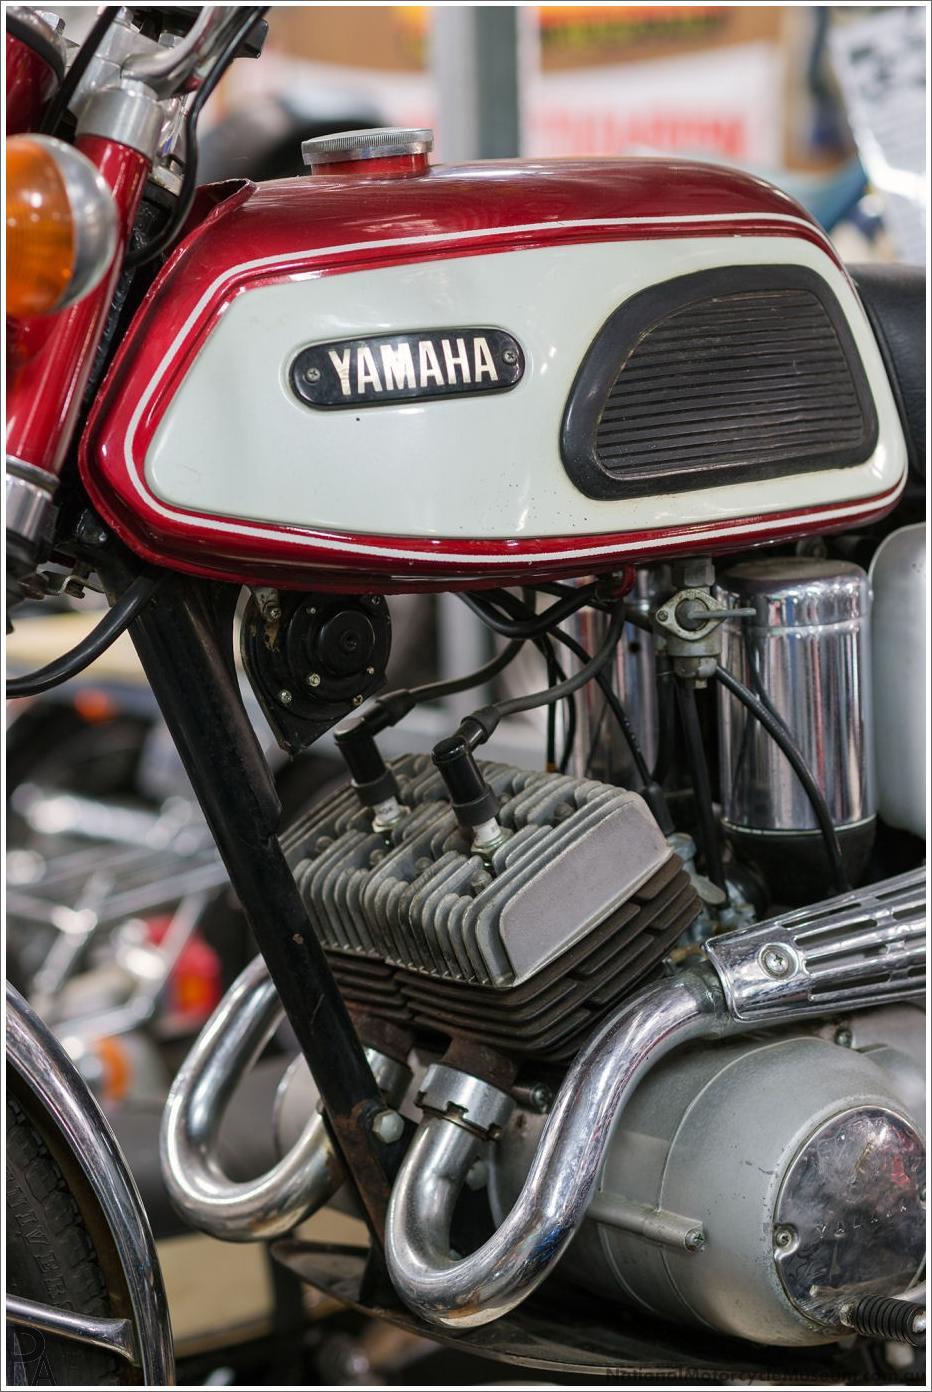 Yamaha yr2c 350cc twin 1968 for Yamaha 350cc motorcycles